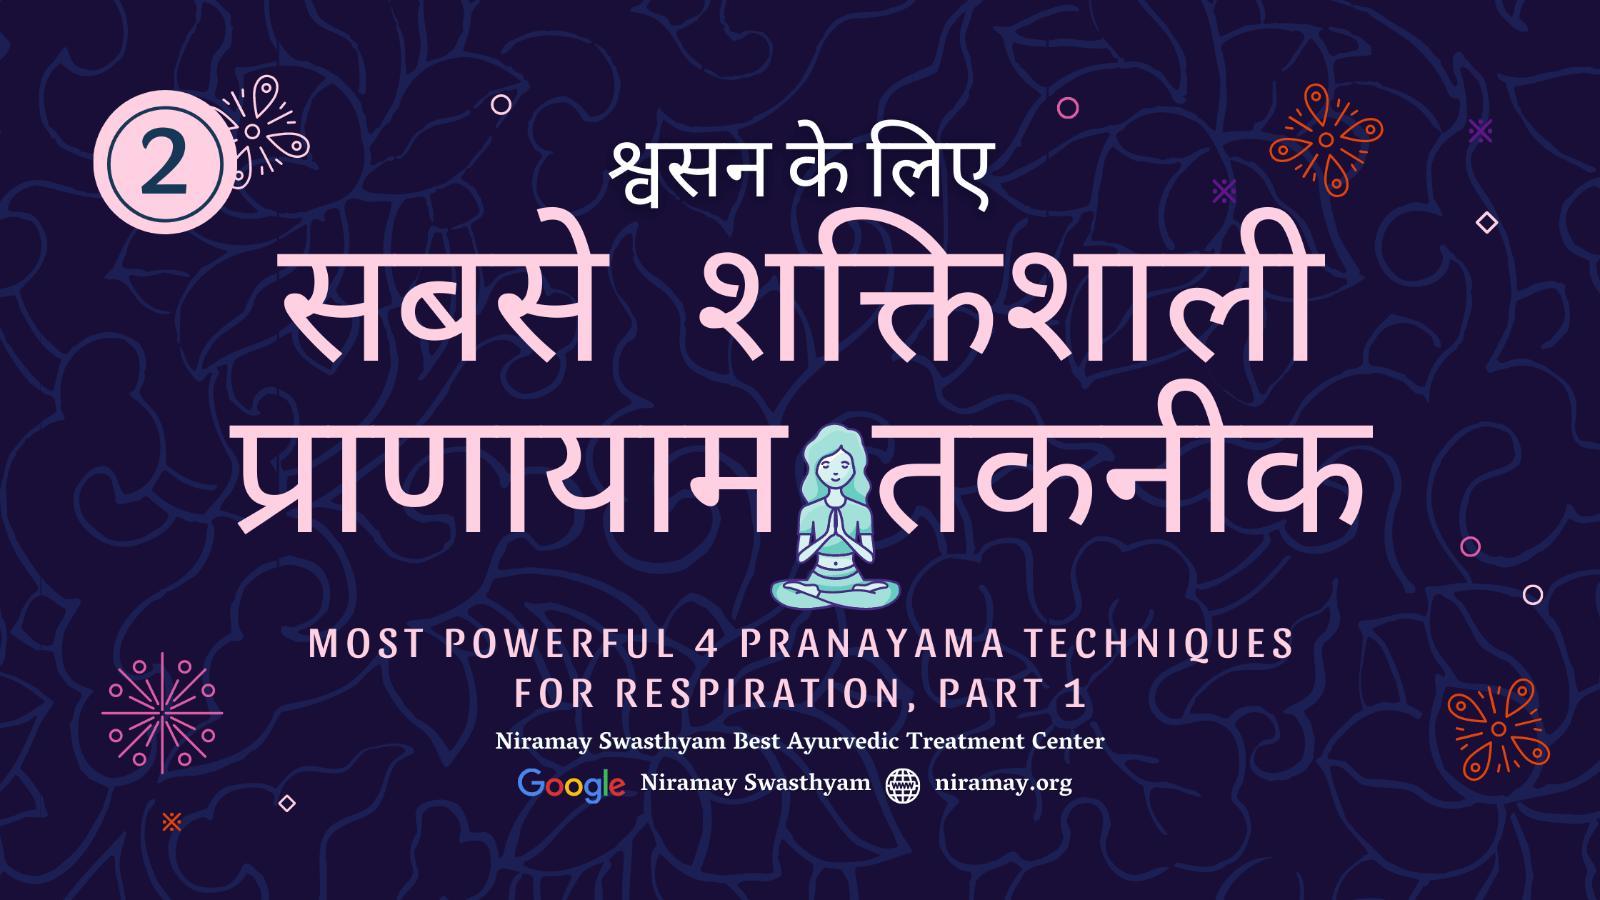 श्वास की शक्ति: 4 प्राणायाम तकनीक अभ्यास के लायक Part 2 Most Powerful 4 Pranayama Techniques for respiration, Part 2 Niramay Swasthyam Best Ayurvedic Treatment Center स्वस्थ रहो मस्त रहो